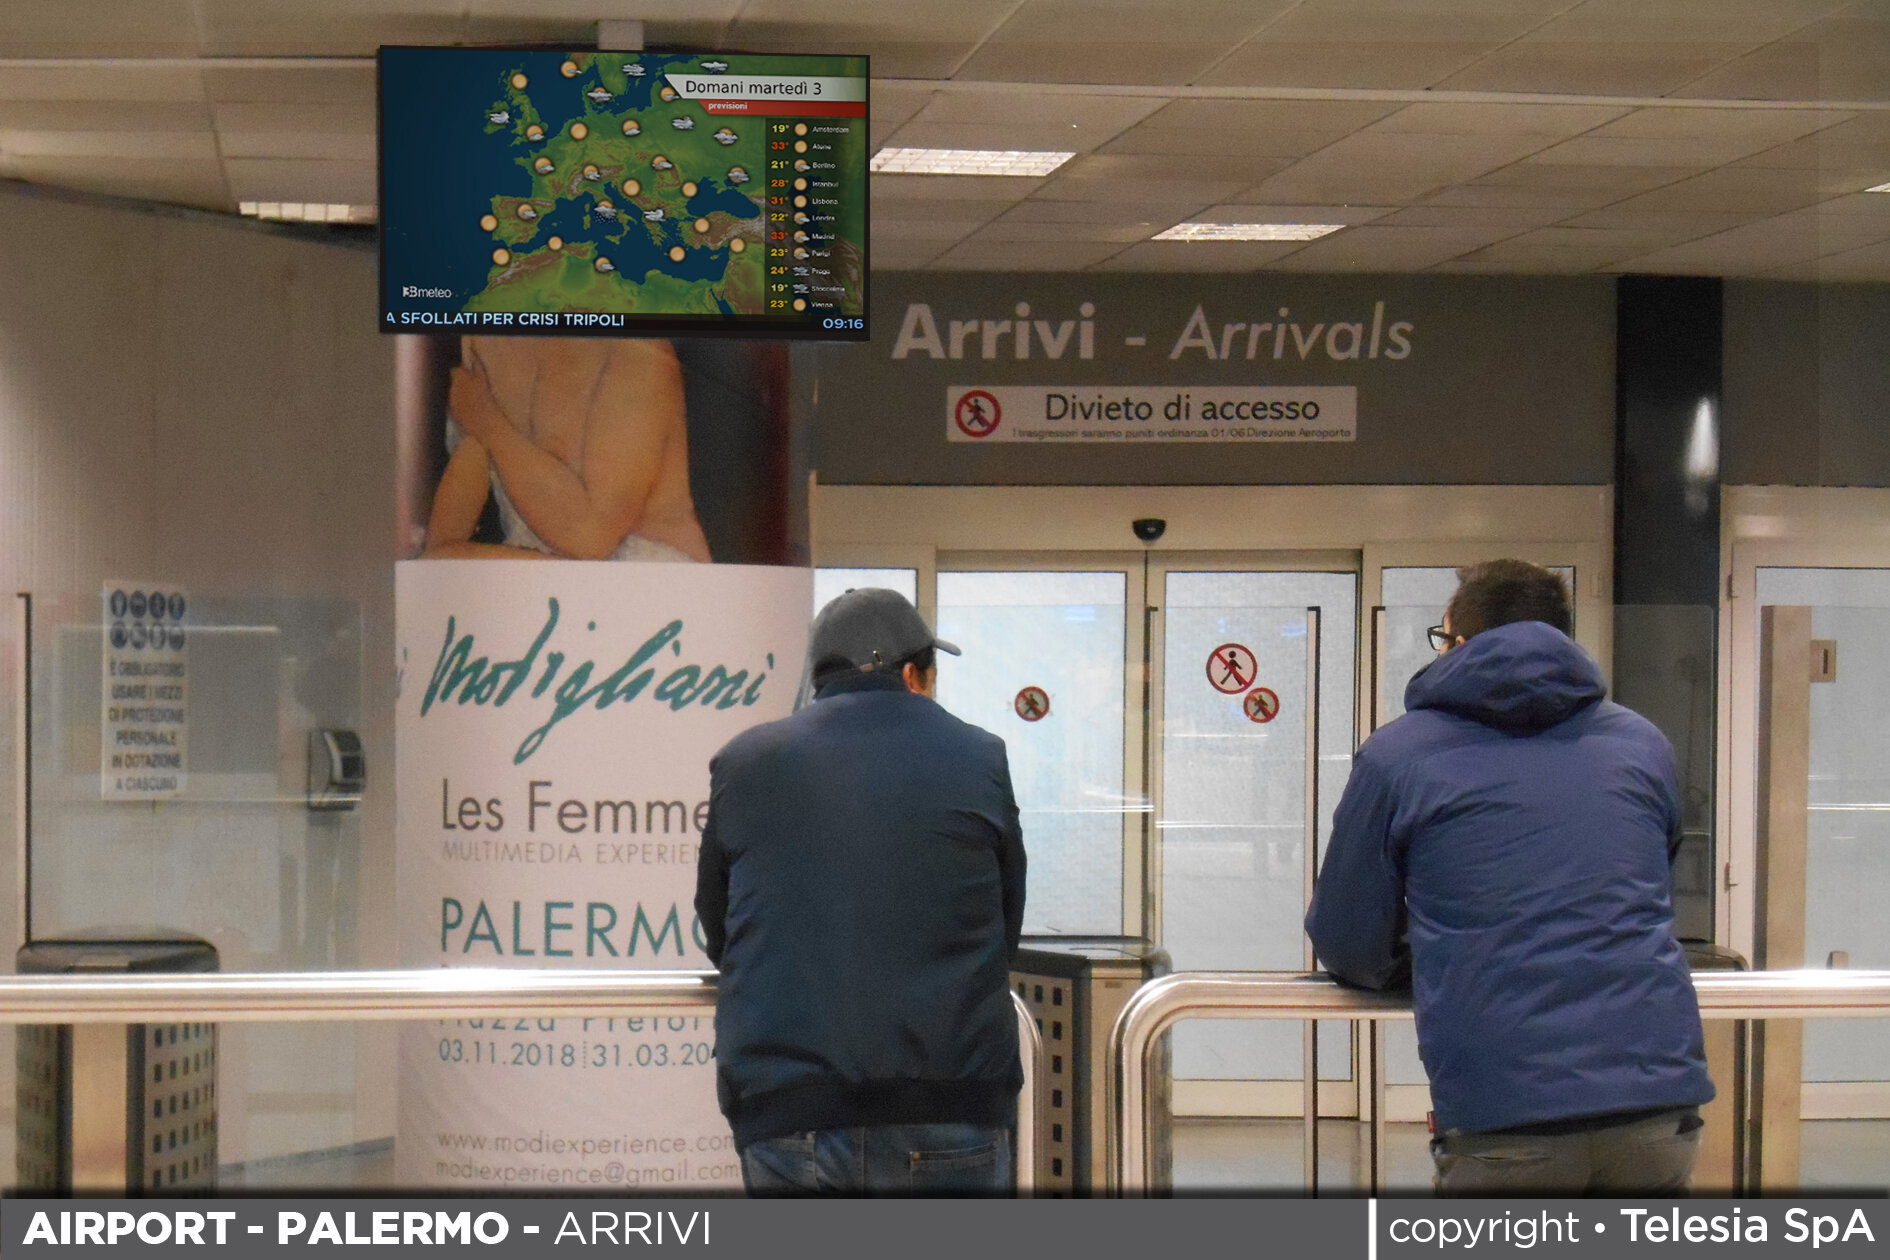 T_airportPalermo1.jpg